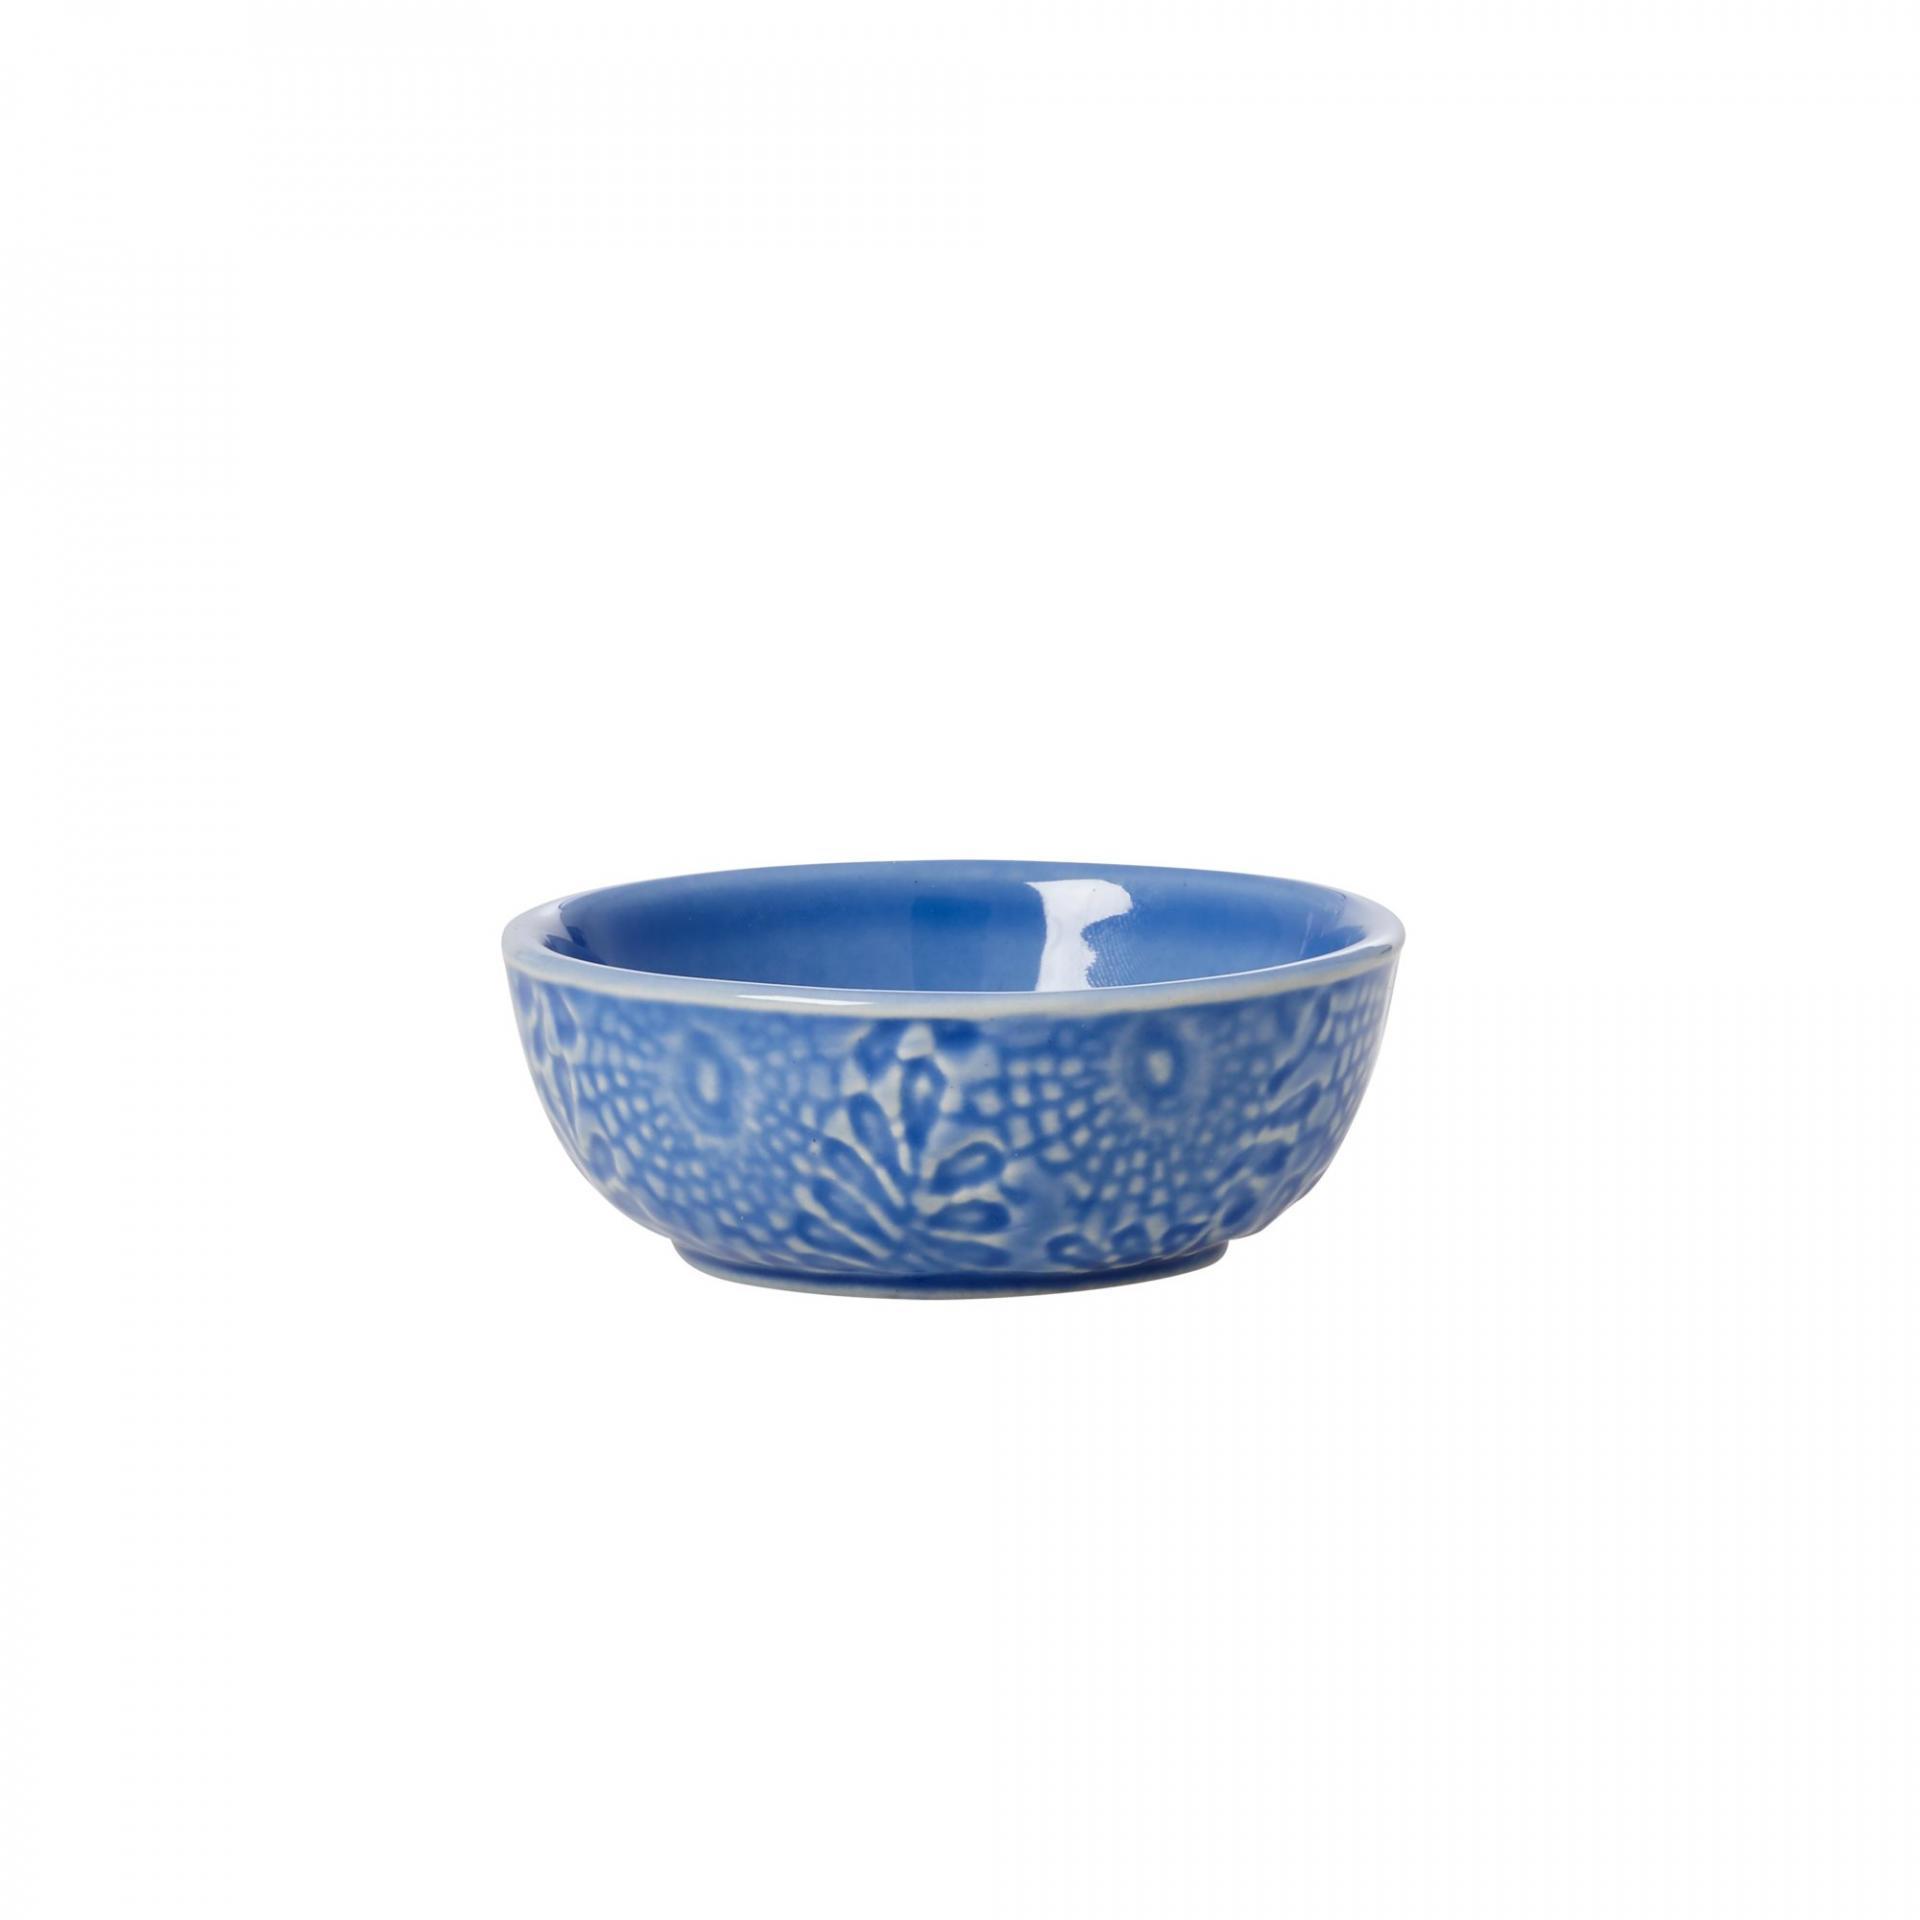 rice Kameninová mini mistička Blue, modrá barva, keramika